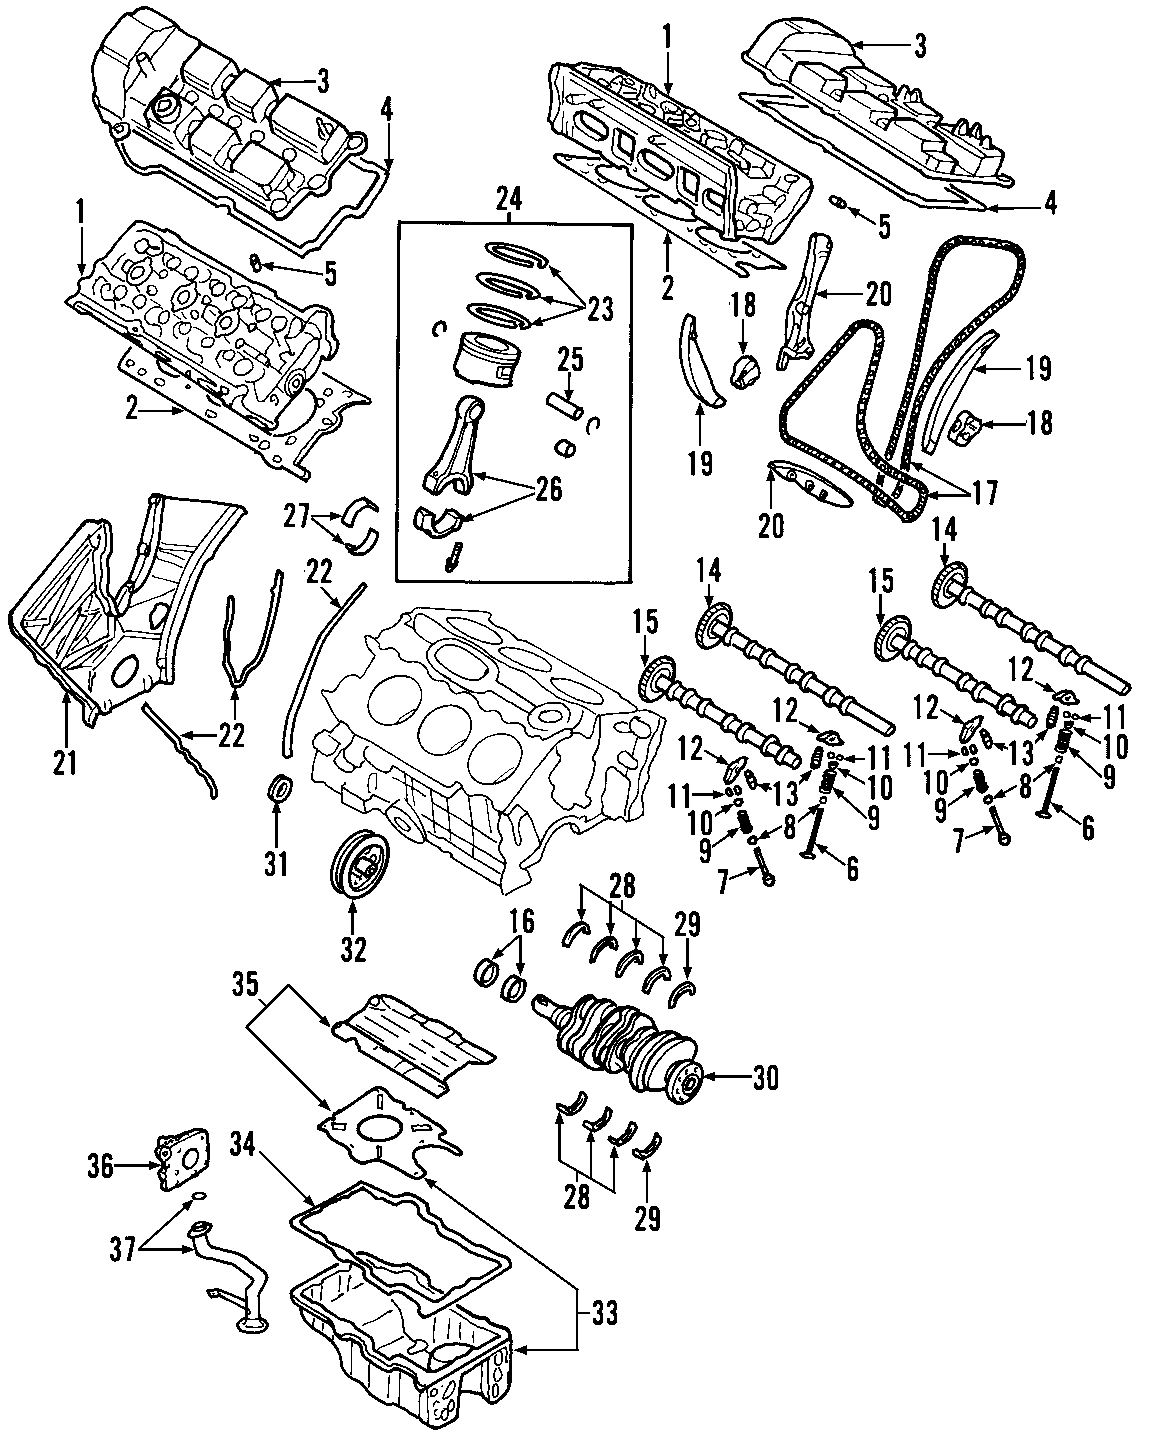 Mazda MPV Engine Crankshaft Thrust Washer. Grade, BEARINGS